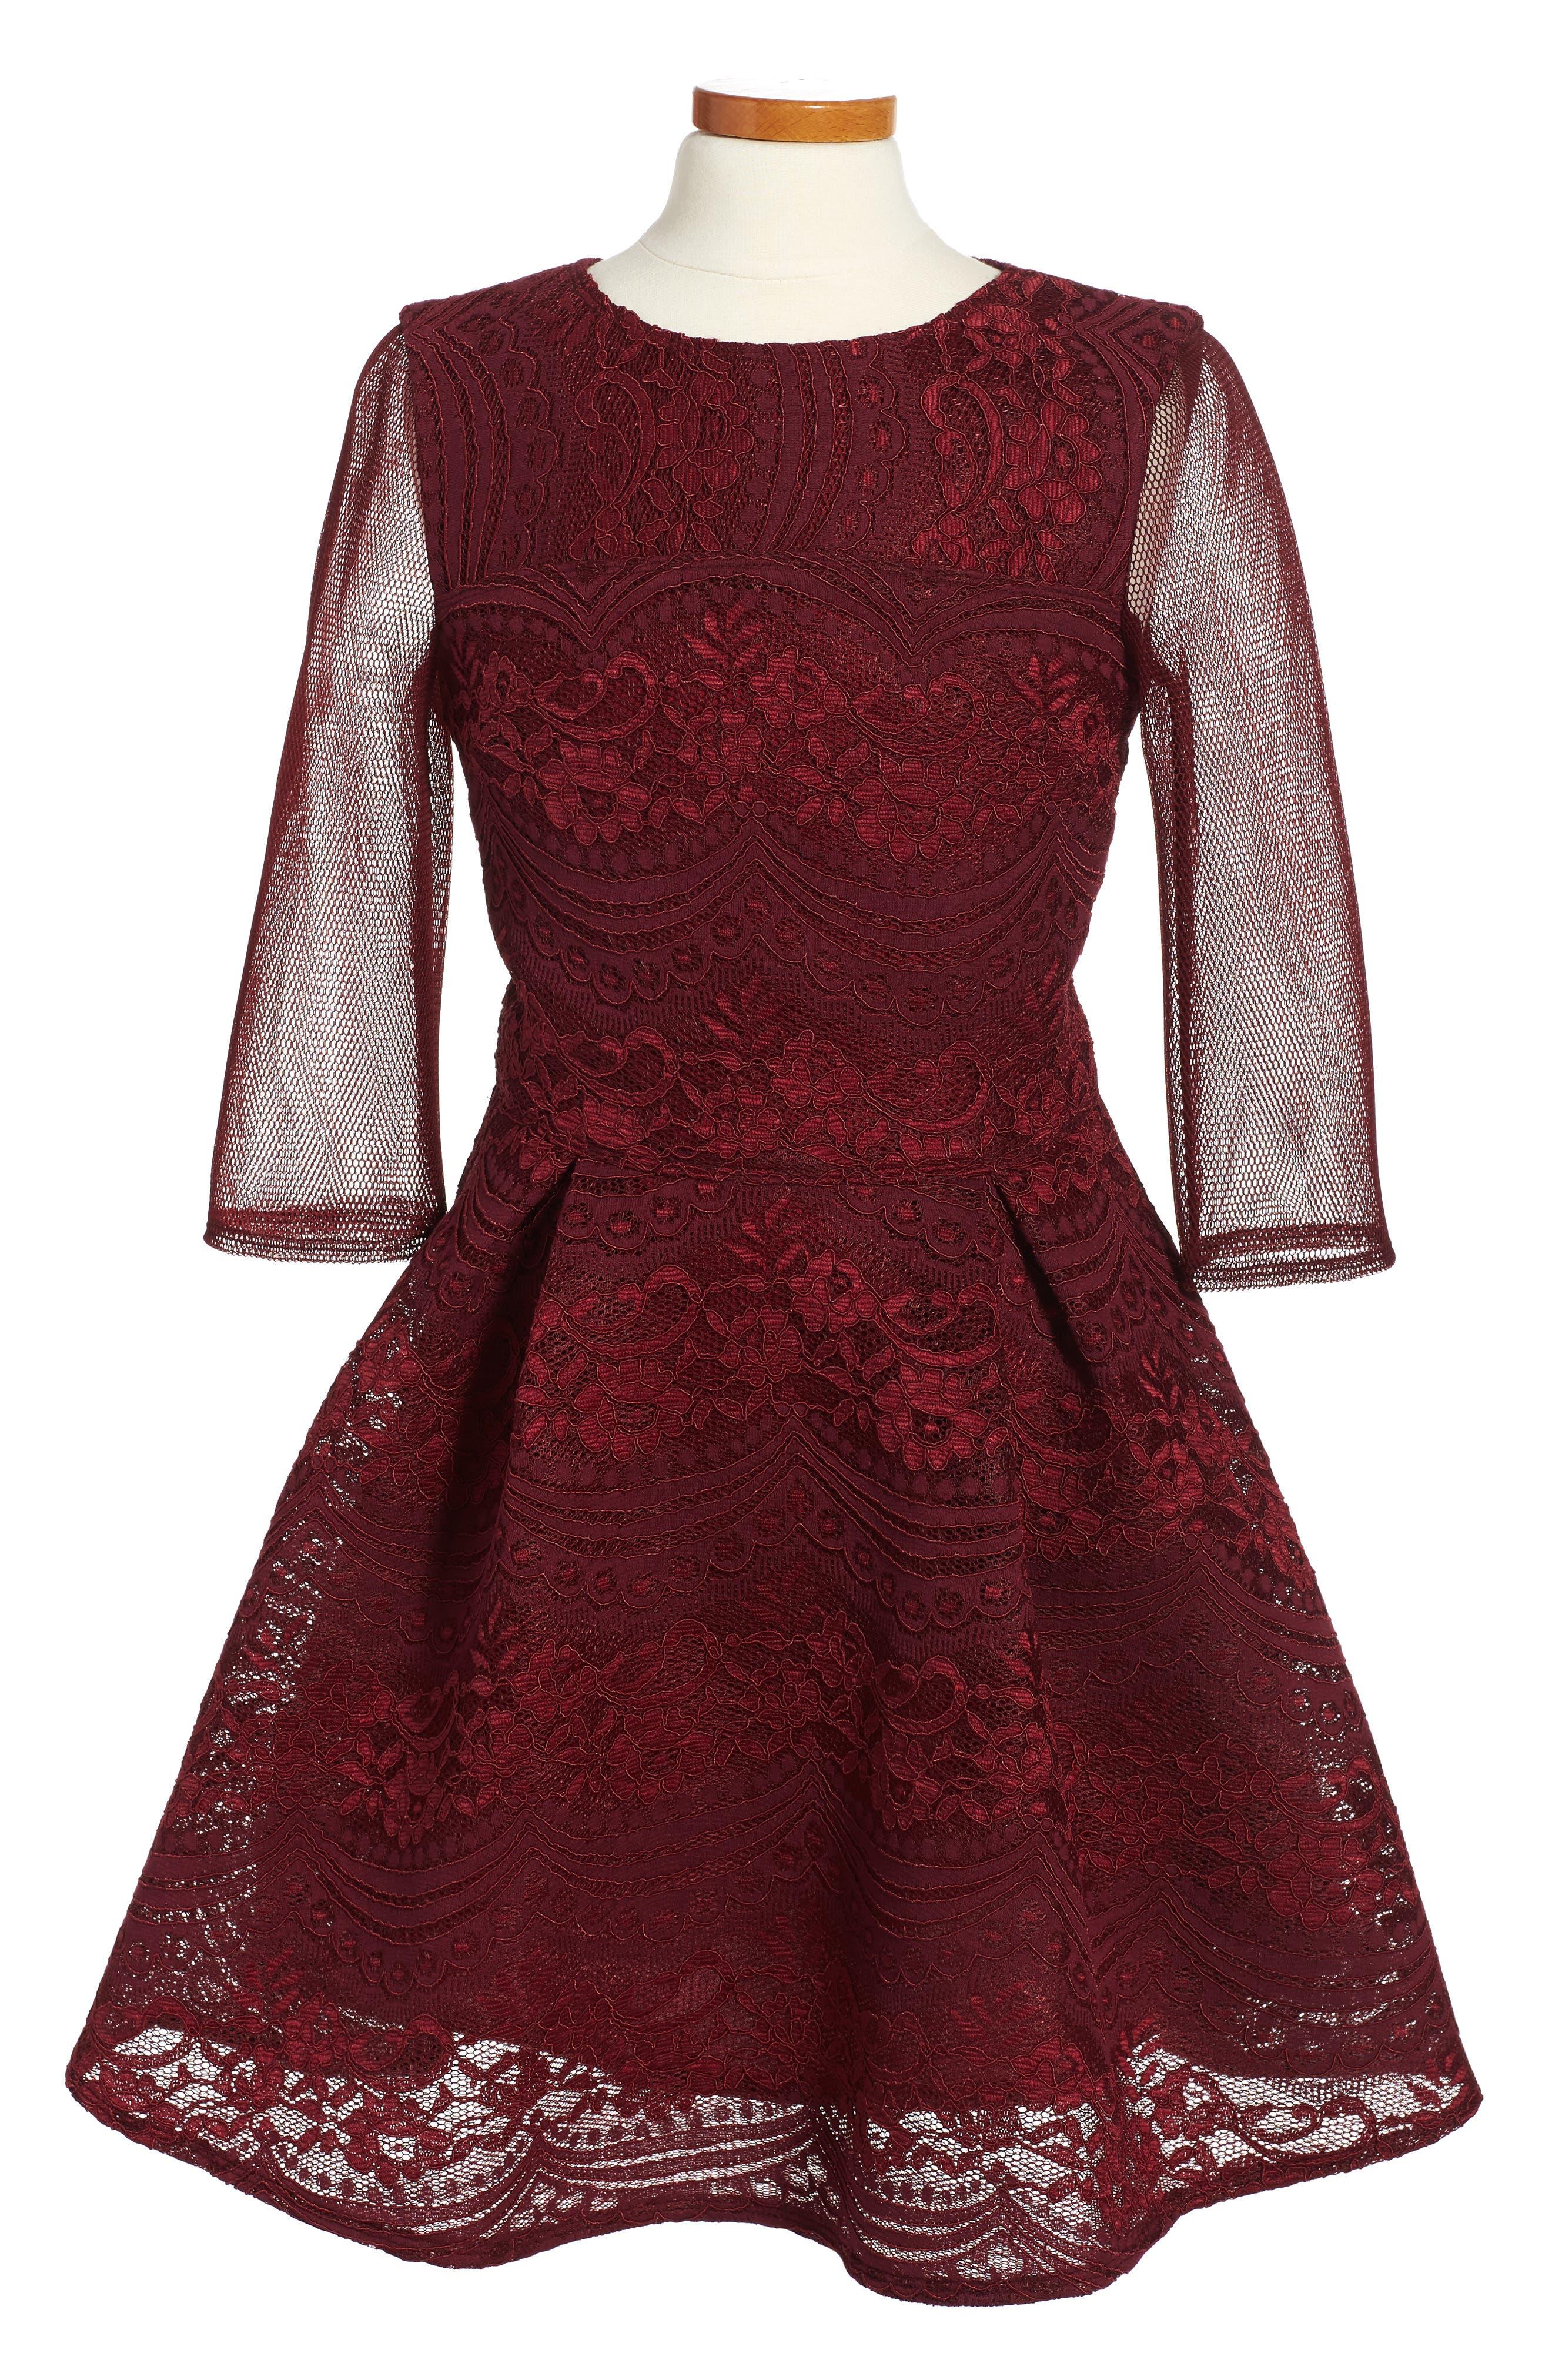 David Charles Techno Lace Dress (Big Girls)